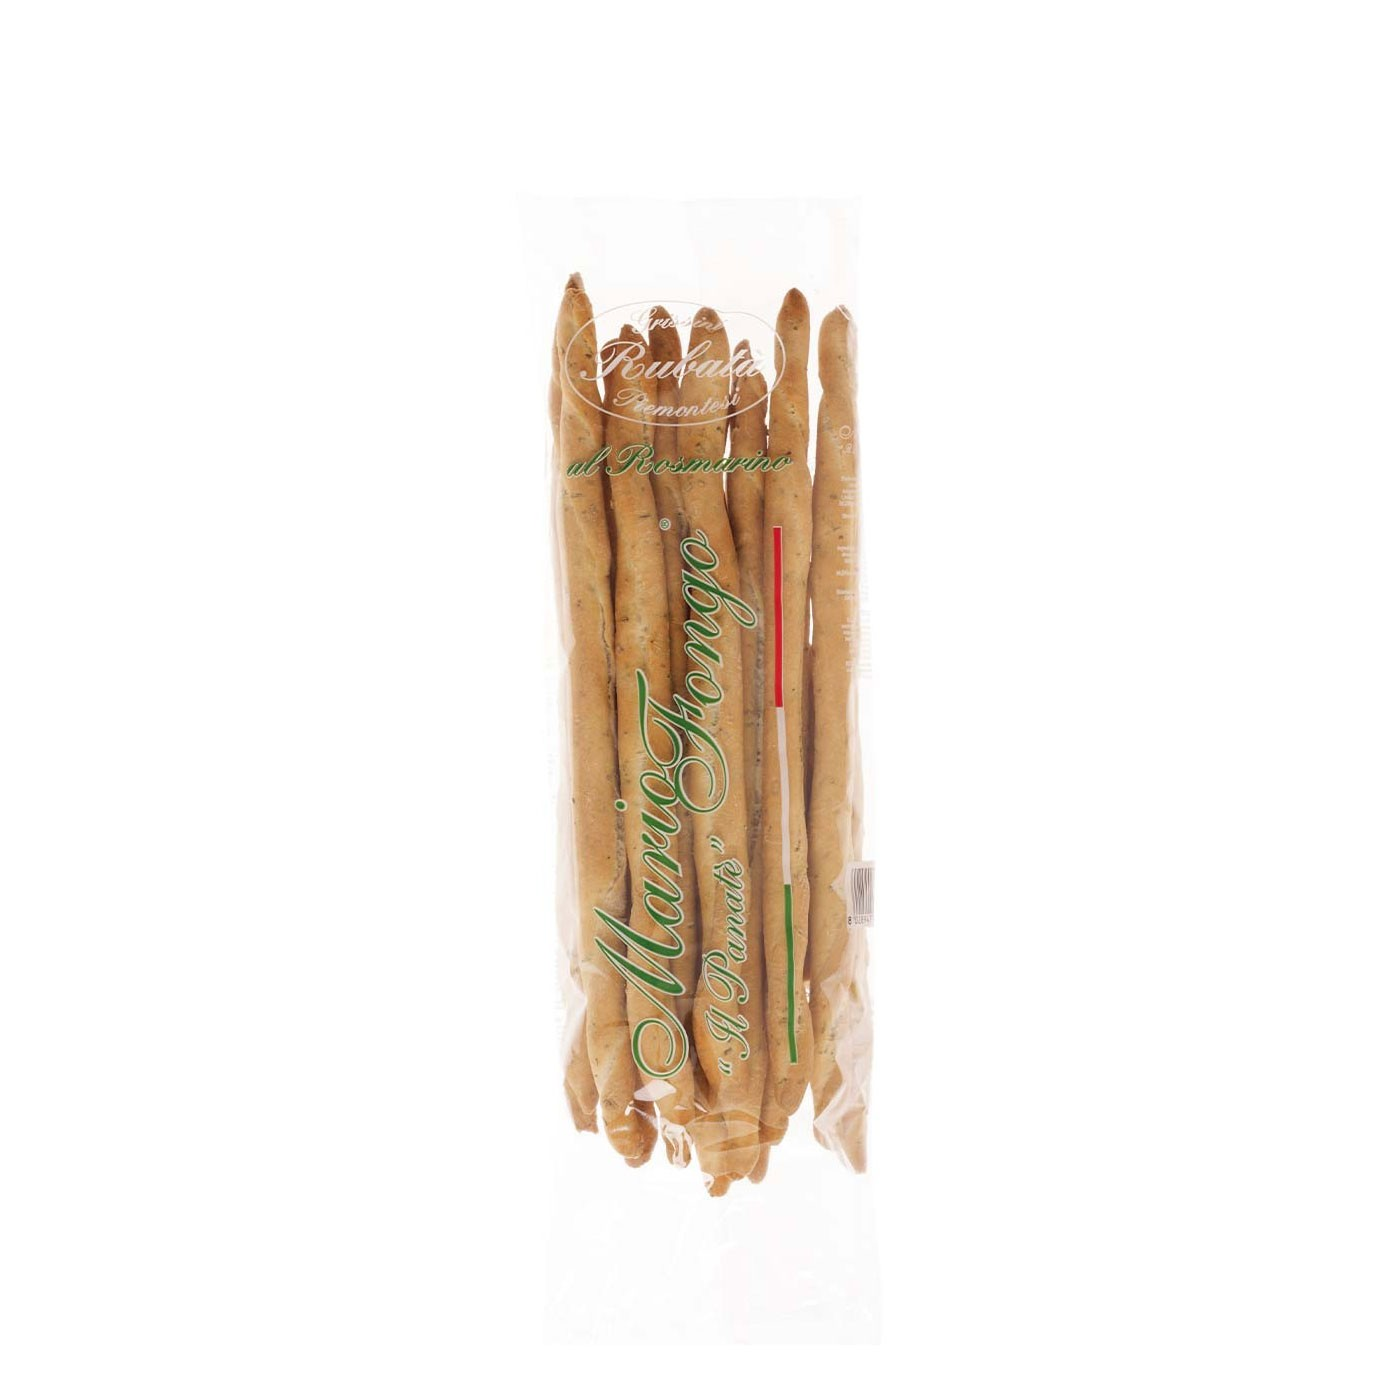 Rubatà Rosemary Breadksticks 7.1 oz